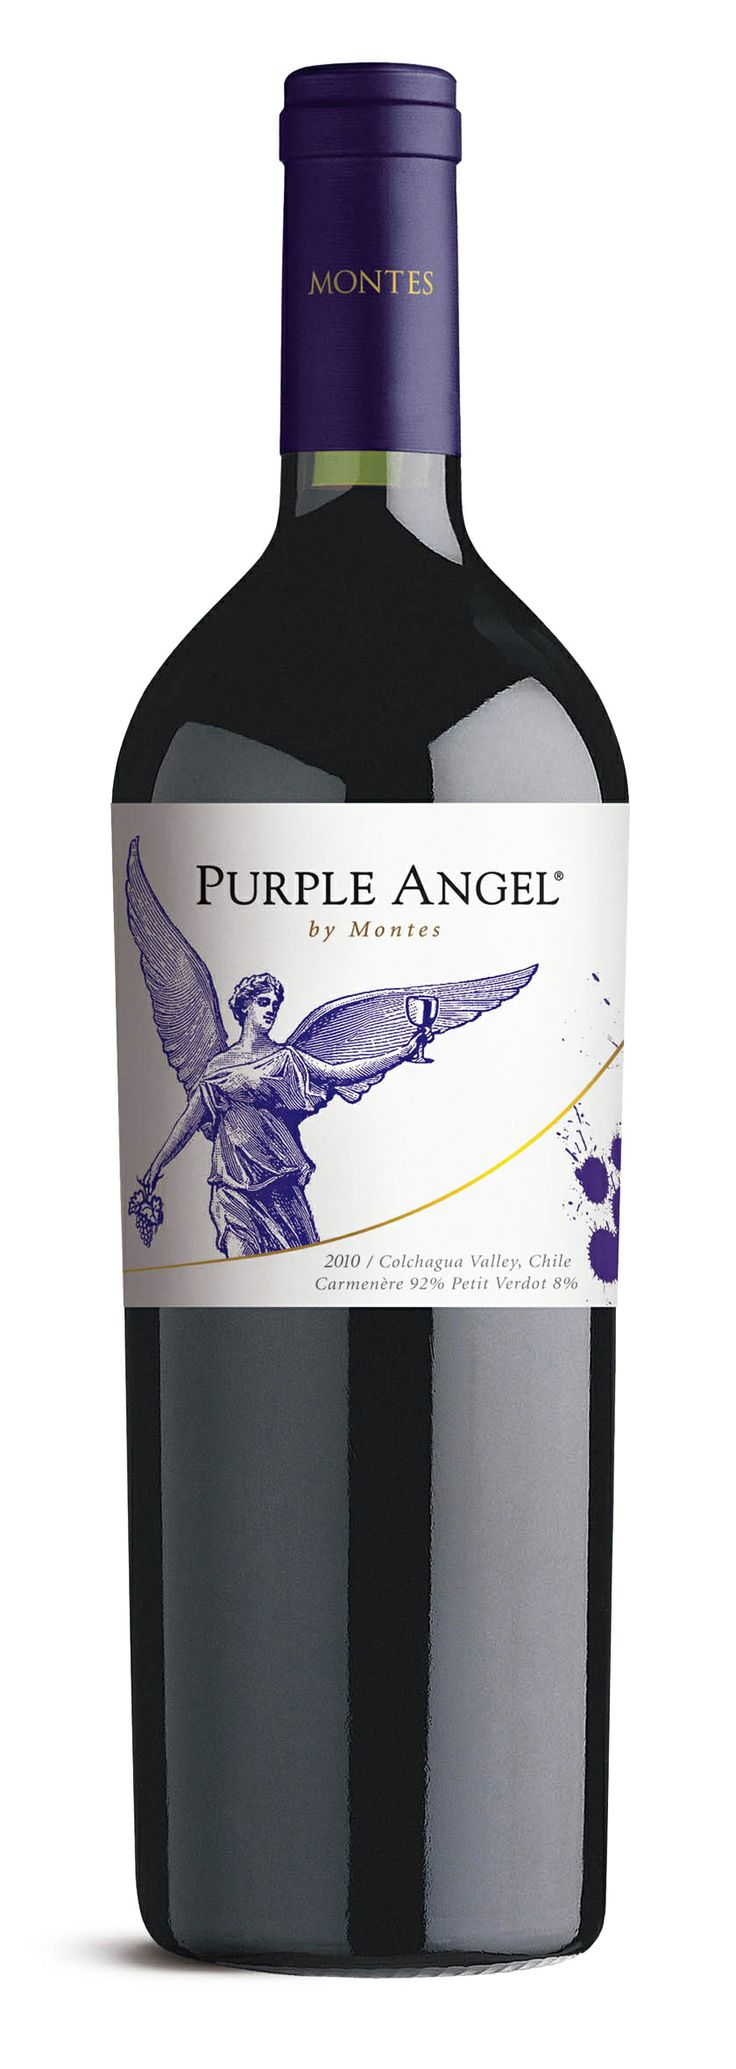 Carménère 2010 *Purple Angel* -  Viña Montes, Valle de Colchagua, Región de O'Higgins ----------------- Terroir: Valle de Colchagua (Valle del Rapel, Valle Central) - Región de O'Higgins